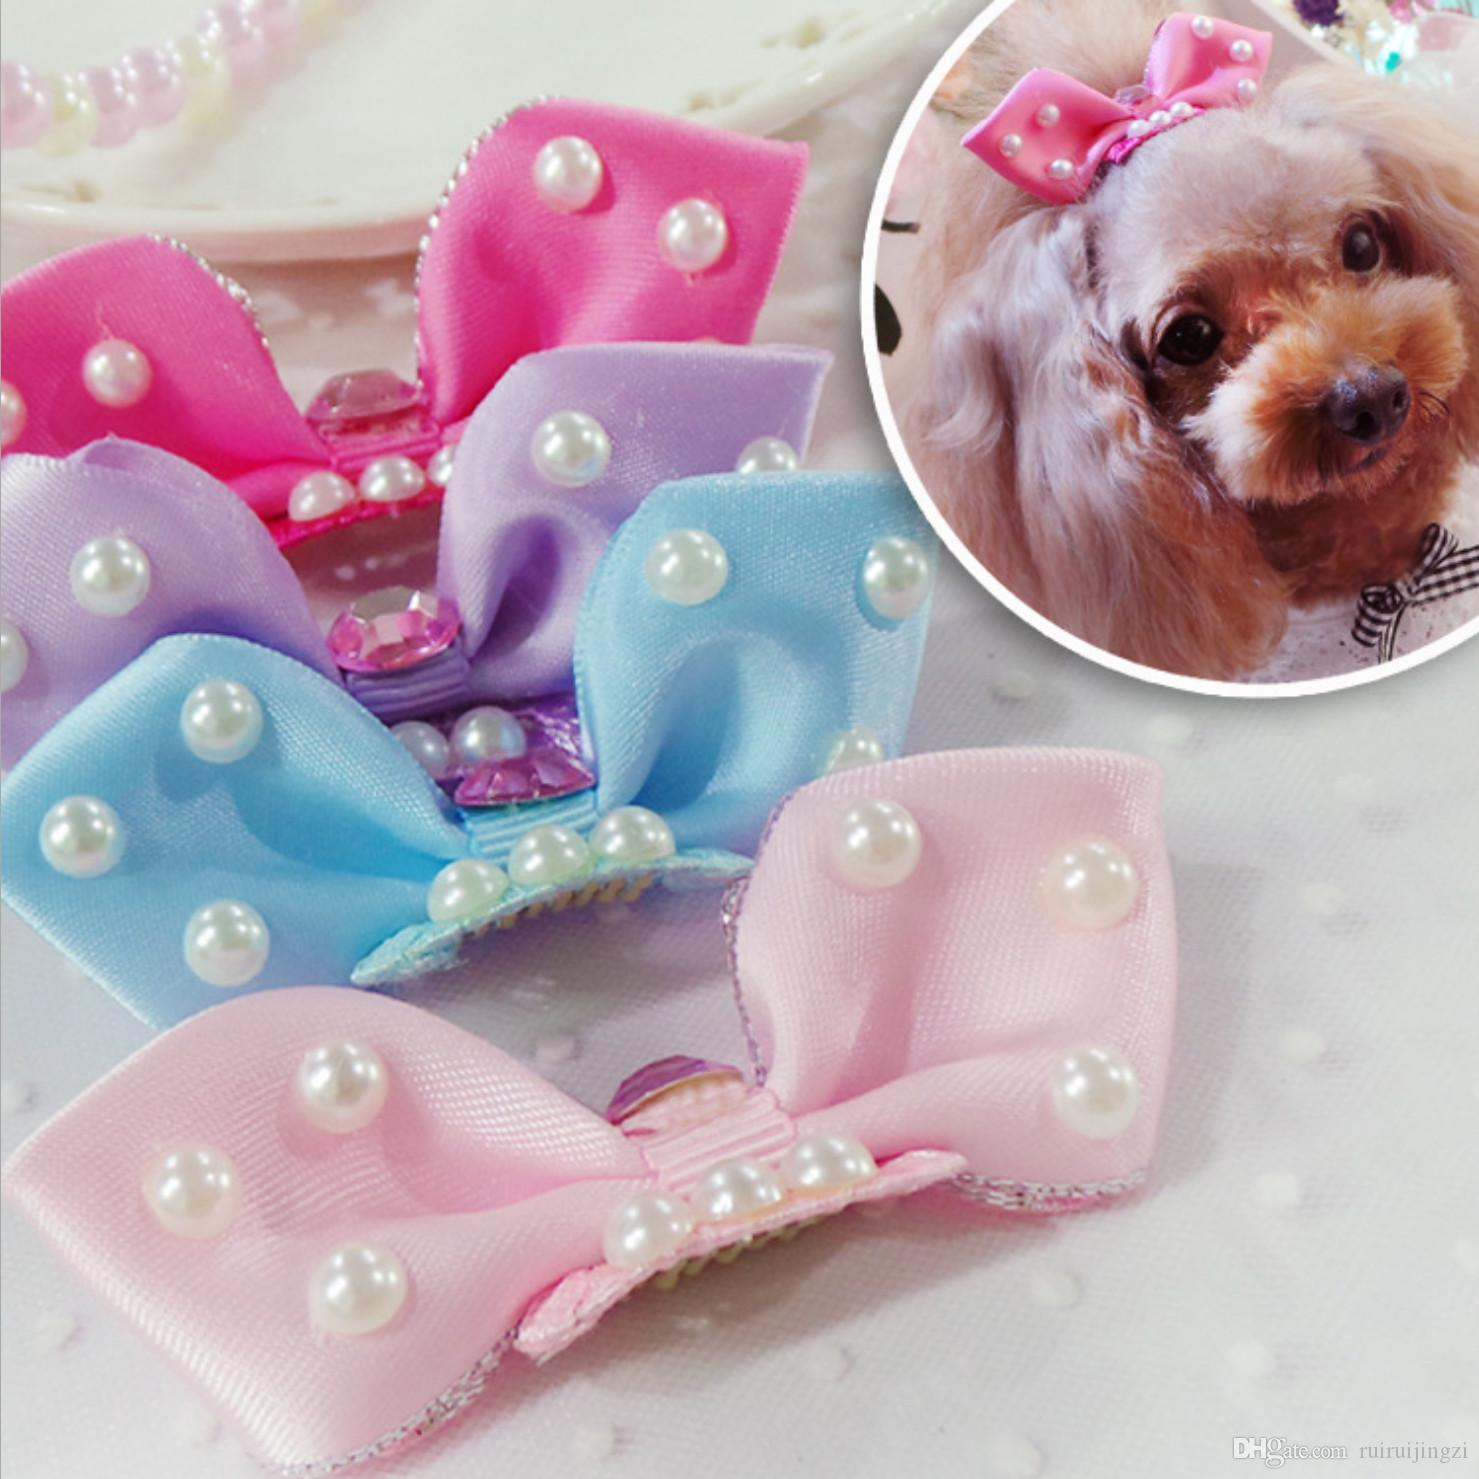 Pet Dog Comb Hairpin BB Hair Clips Handmade big bow pearl hair accessories cut Grooming Hair Accessories 20PCS/LOT